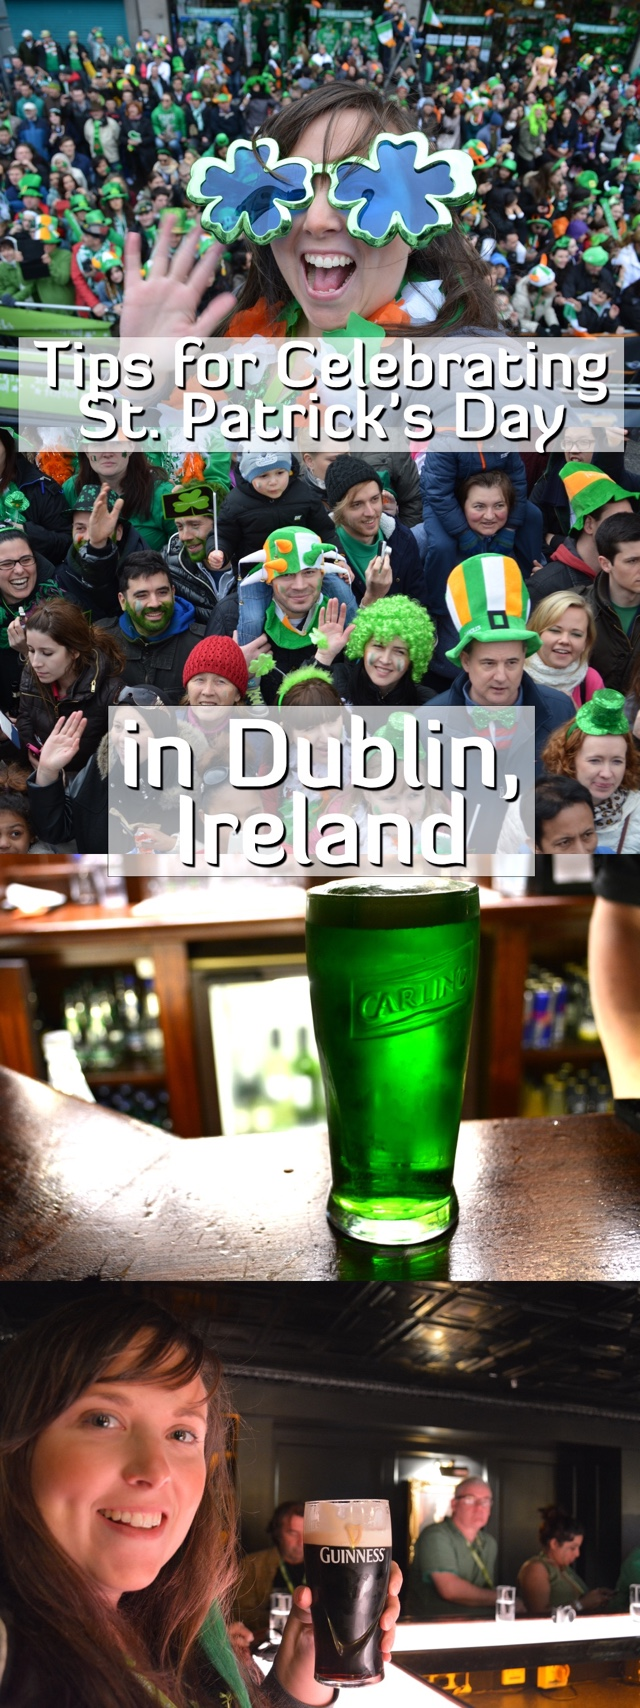 tips for celebrating st patricks day in dublin, ireland pin